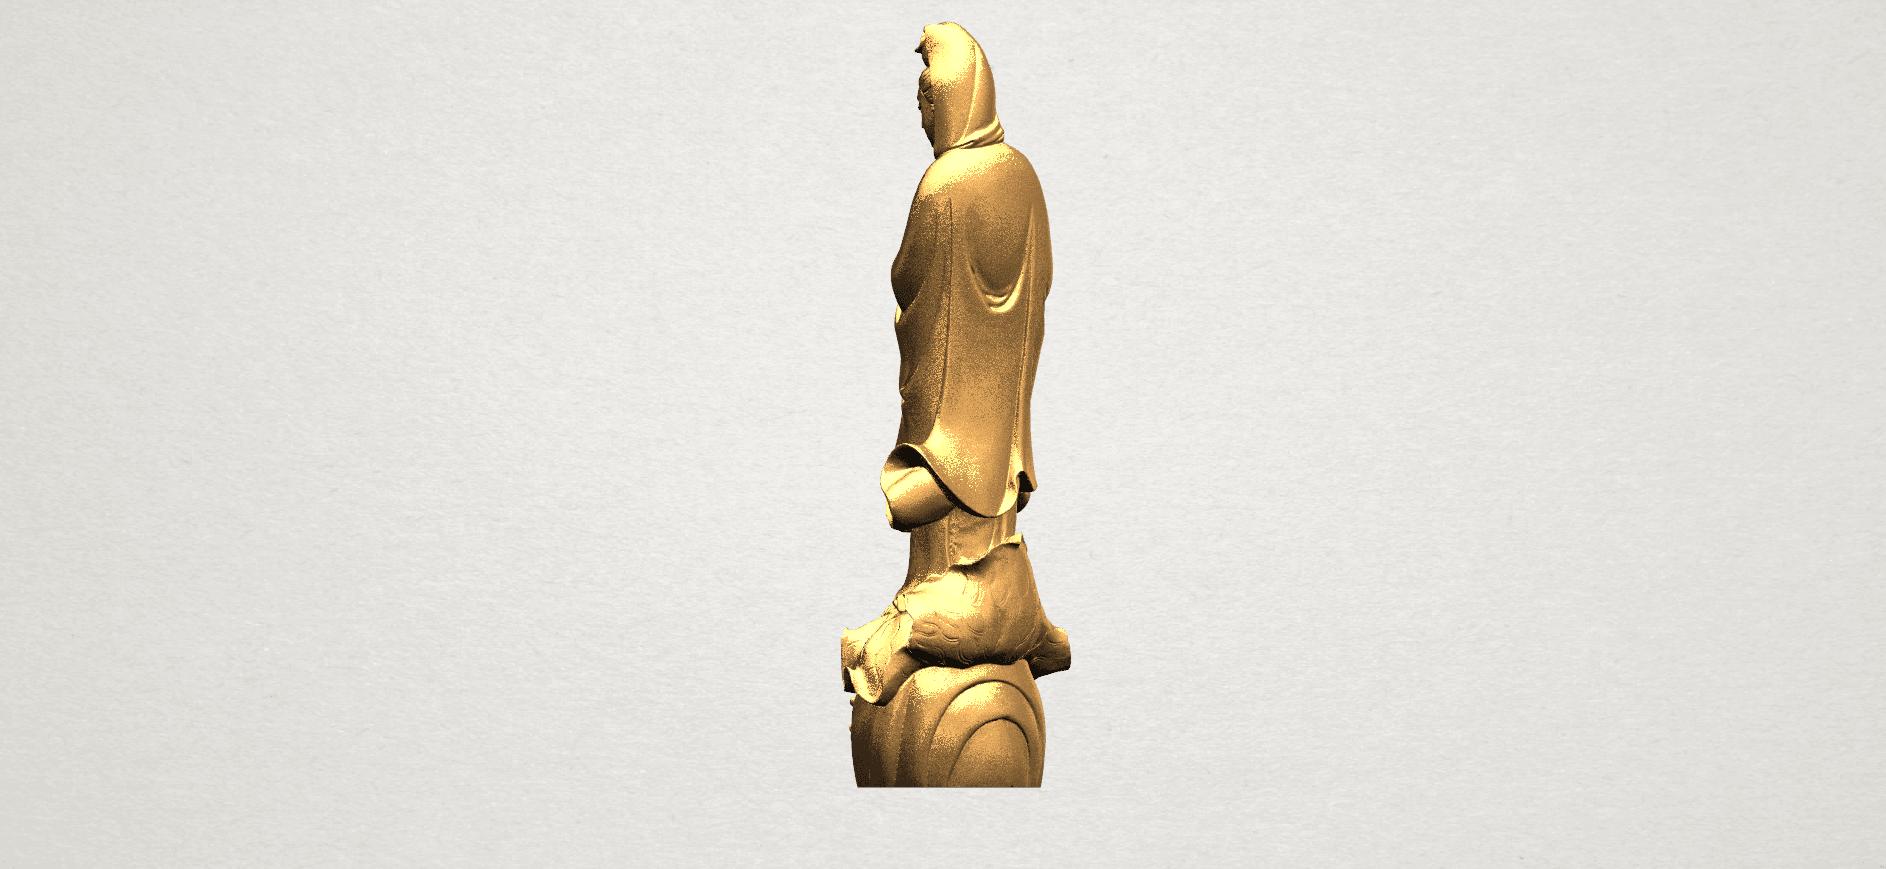 Avalokitesvara Buddha - Standing (i) A04.png Télécharger fichier STL gratuit Avalokitesvara Bodhisattva - Debout 01 • Design à imprimer en 3D, GeorgesNikkei